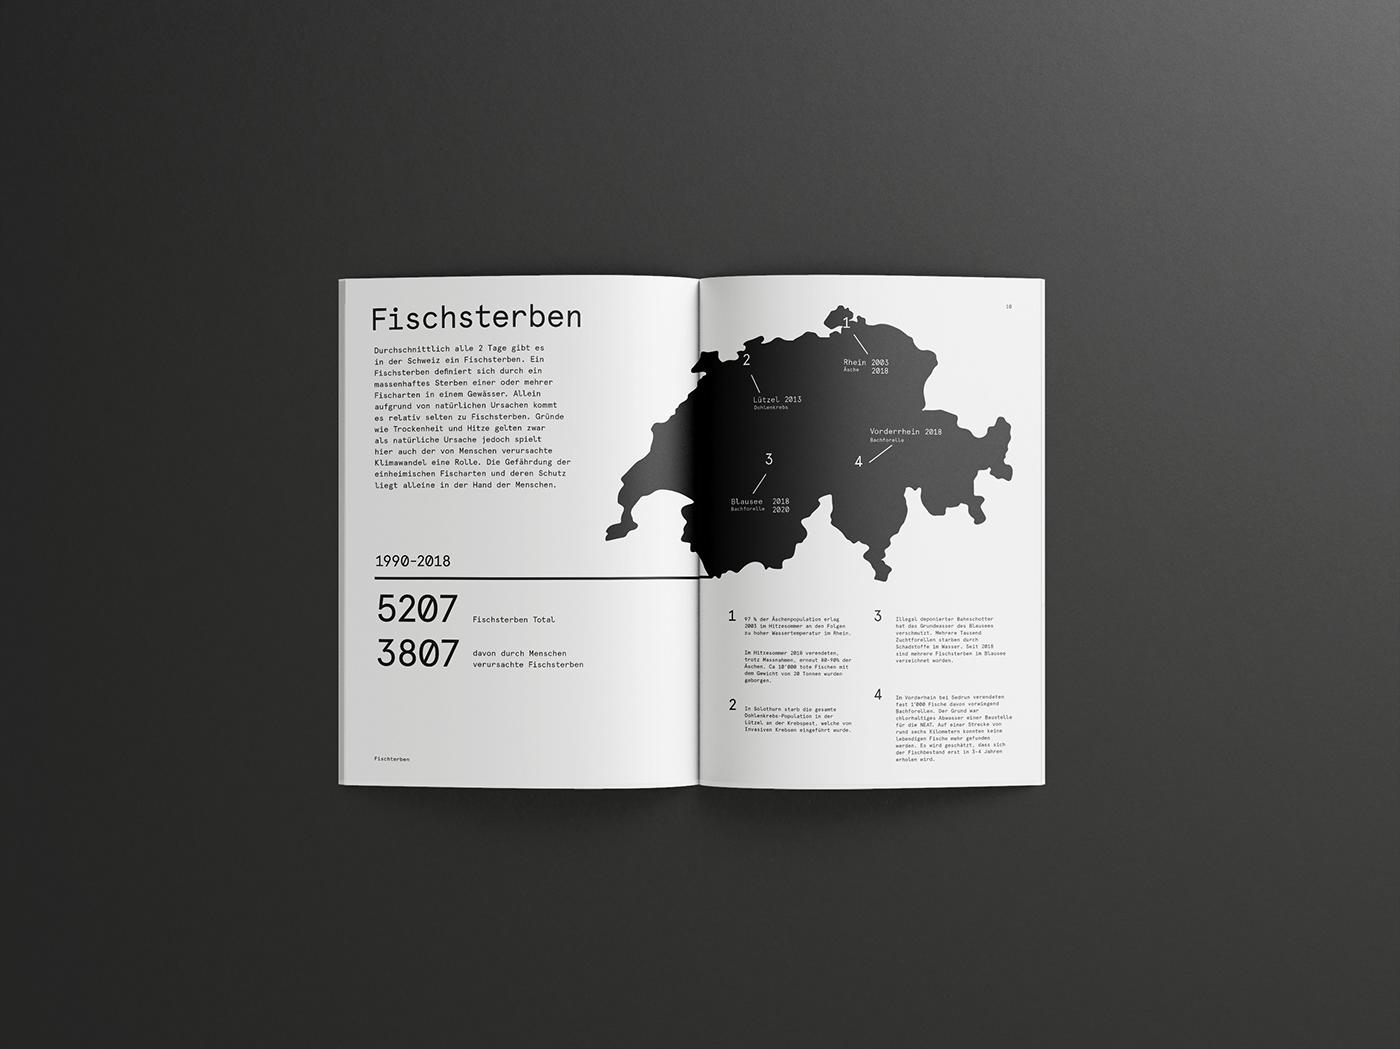 editorial fisch fish graphic design  ILLUSTRATION  infographic print Switzerland